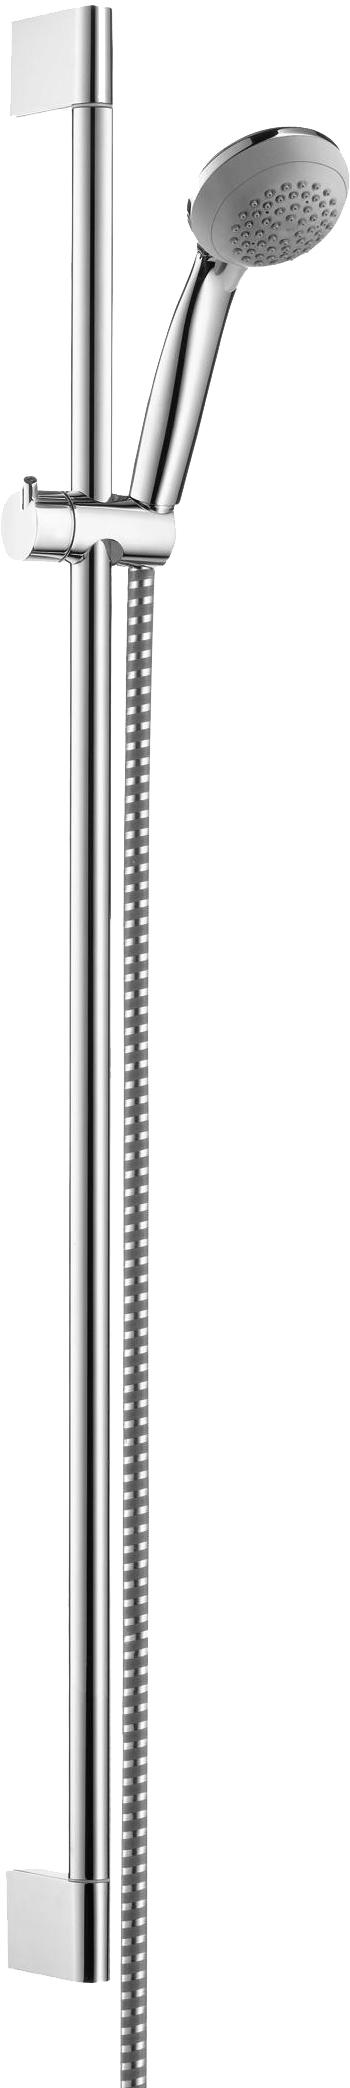 Душевой гарнитур Hansgrohe Crometta 85 27729000 Unica Crometta